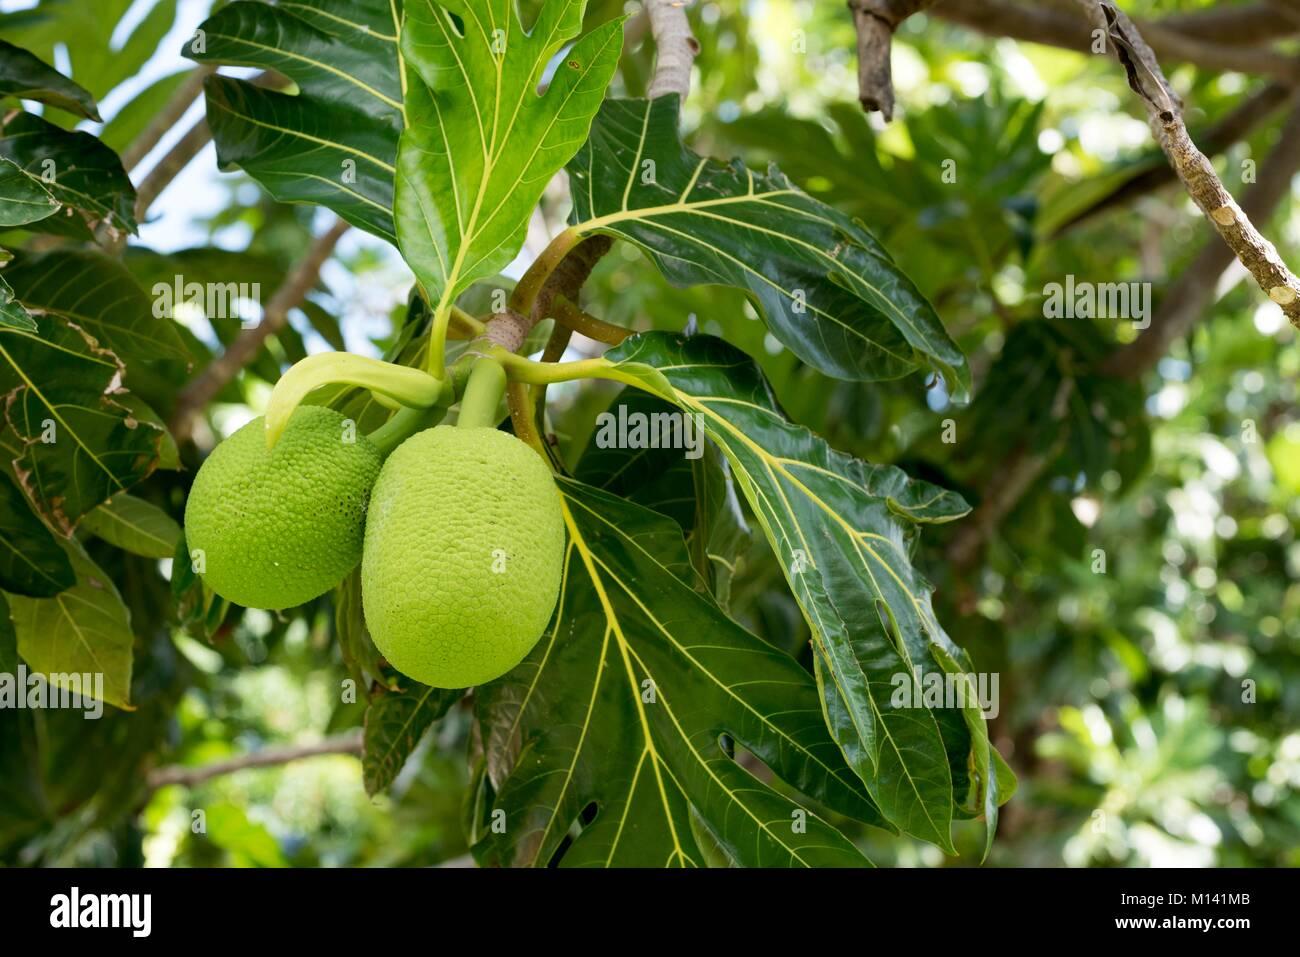 Frankreich, Französisch Polynesien, Marquesas Archipel, Ua Huka Insel, Hane, Brotfruchtbaum (Artocarpus altilis) Stockbild